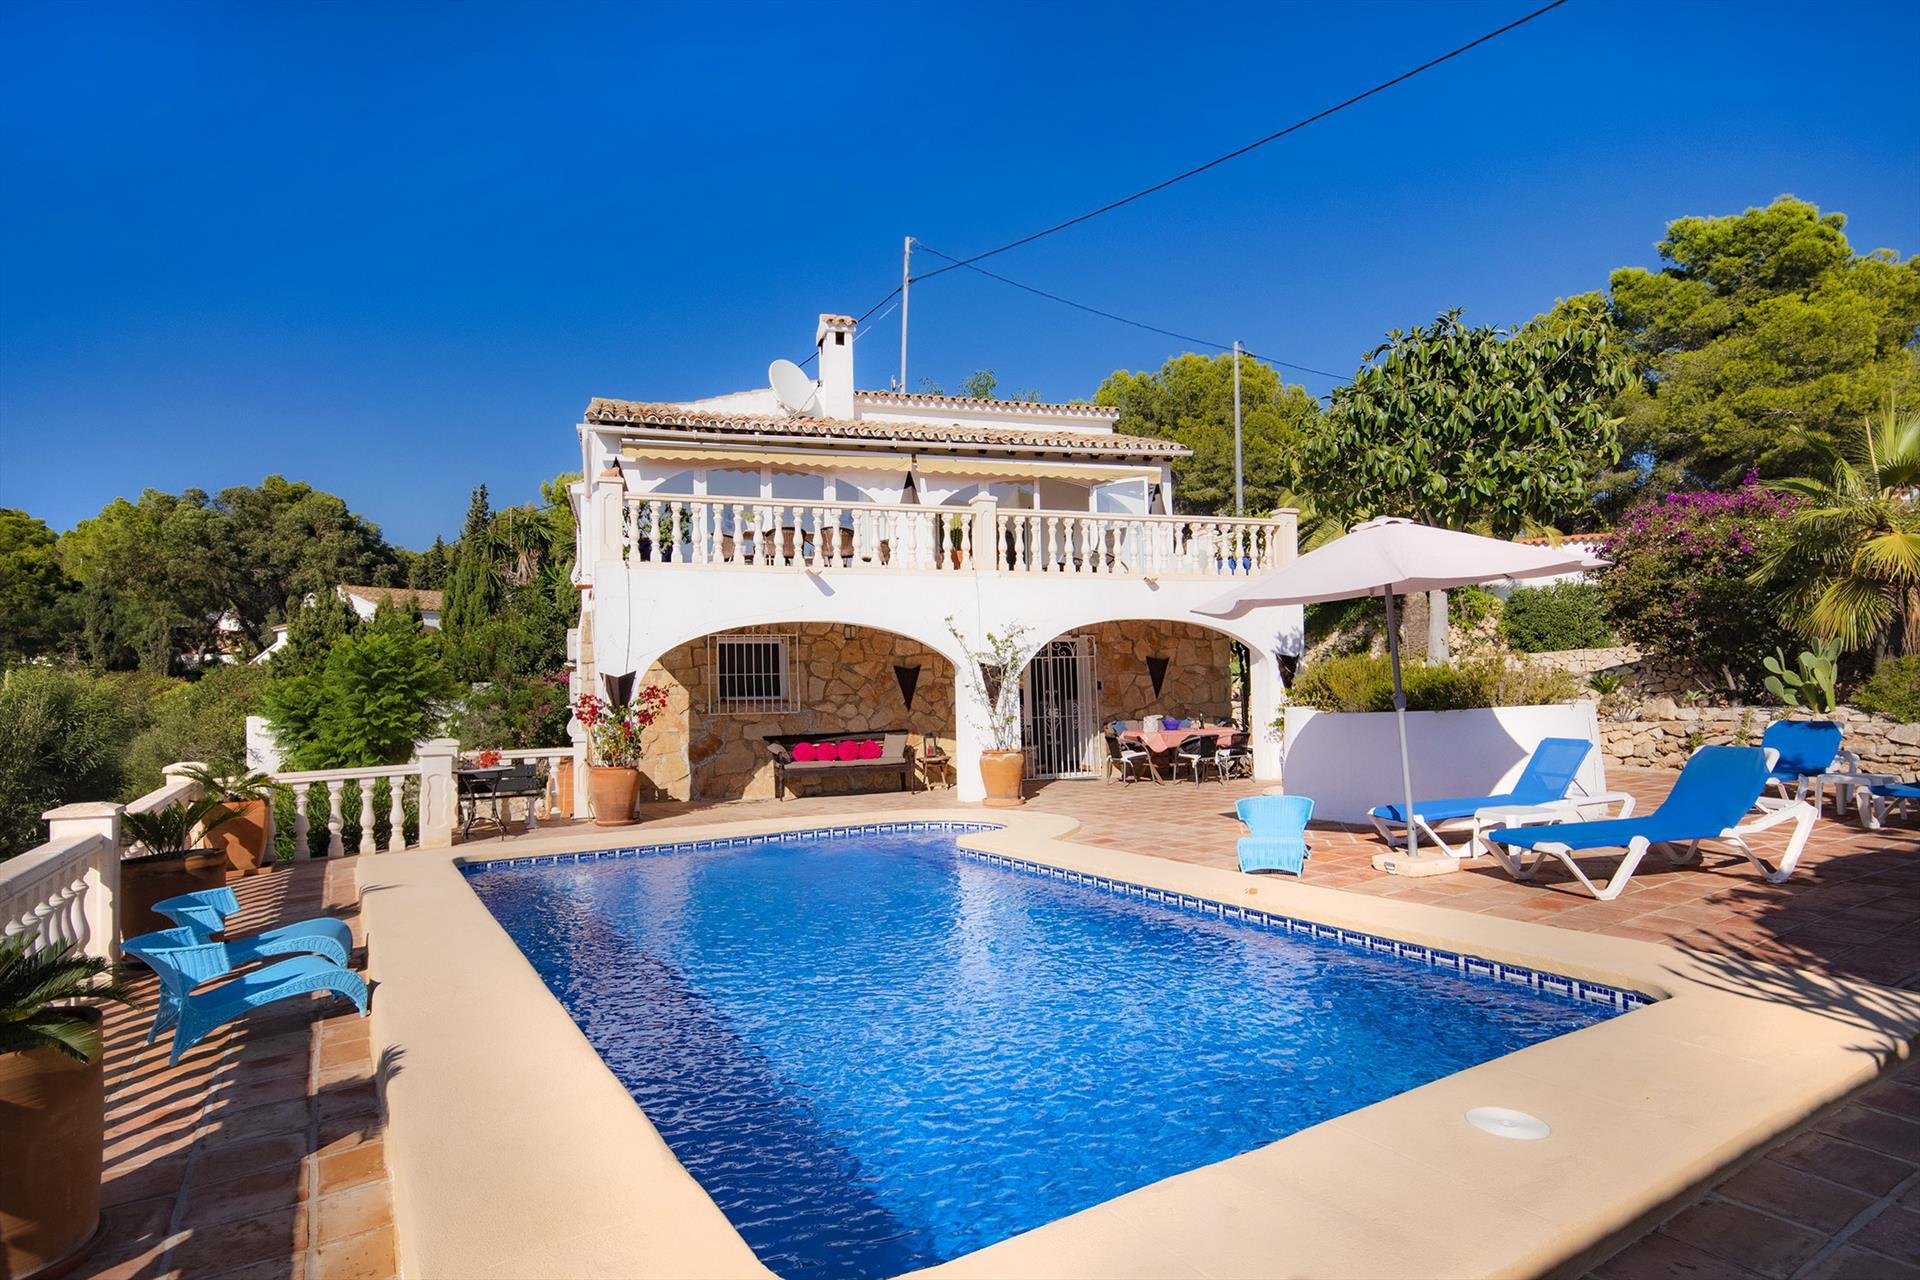 La Llobella - Villa À Benissa, Espagne dedans Villa En Espagne Avec Piscine